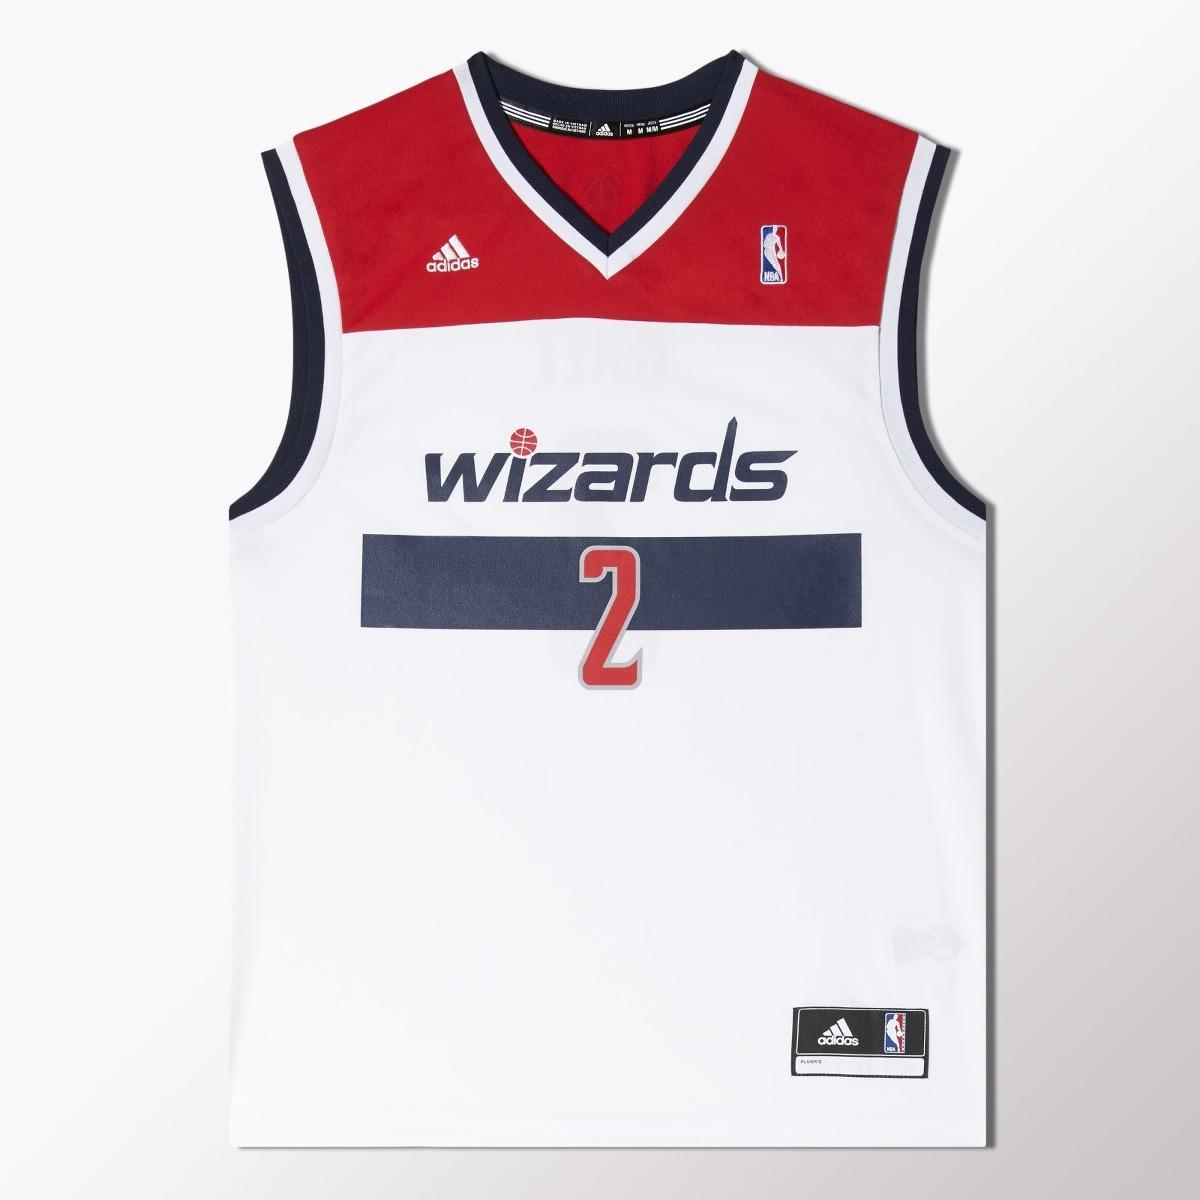 2d2f6318f camisa regata adidas nba washington wizards nº 2 jonh wall. Carregando zoom.